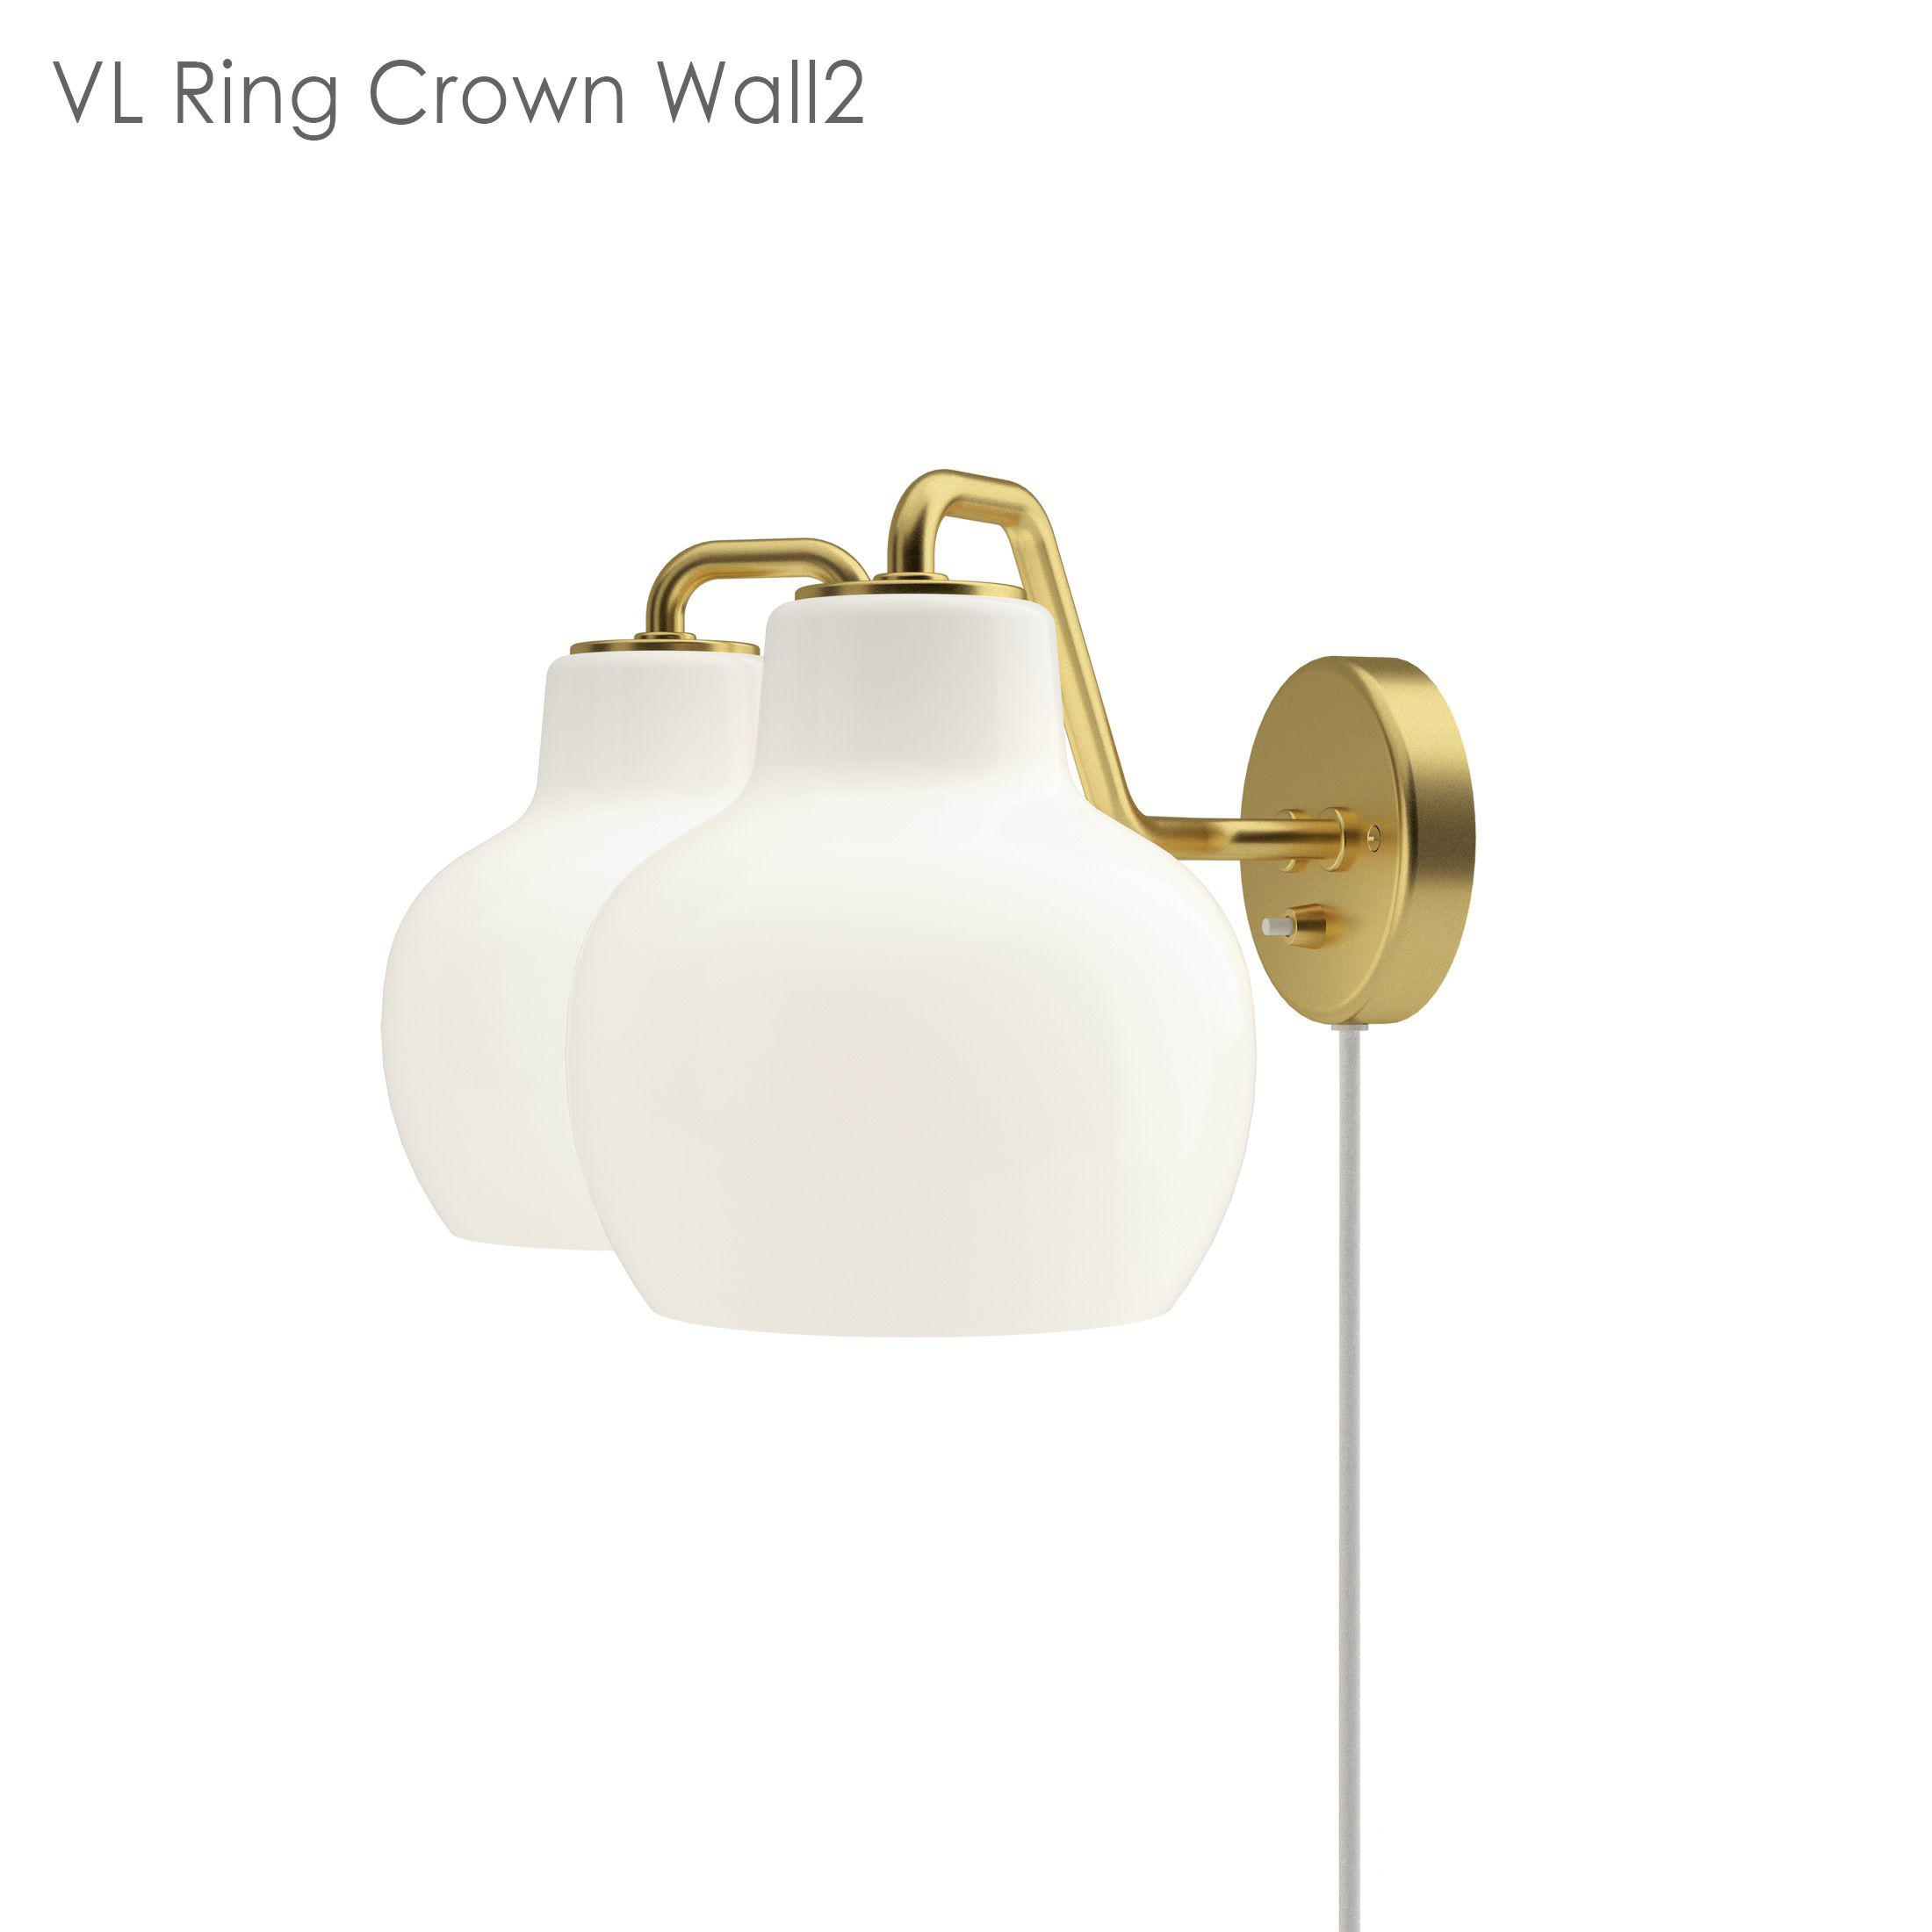 louis poulsen ルイスポールセン VL Ring Crown Wall(リングクラウン)ウォール 2灯